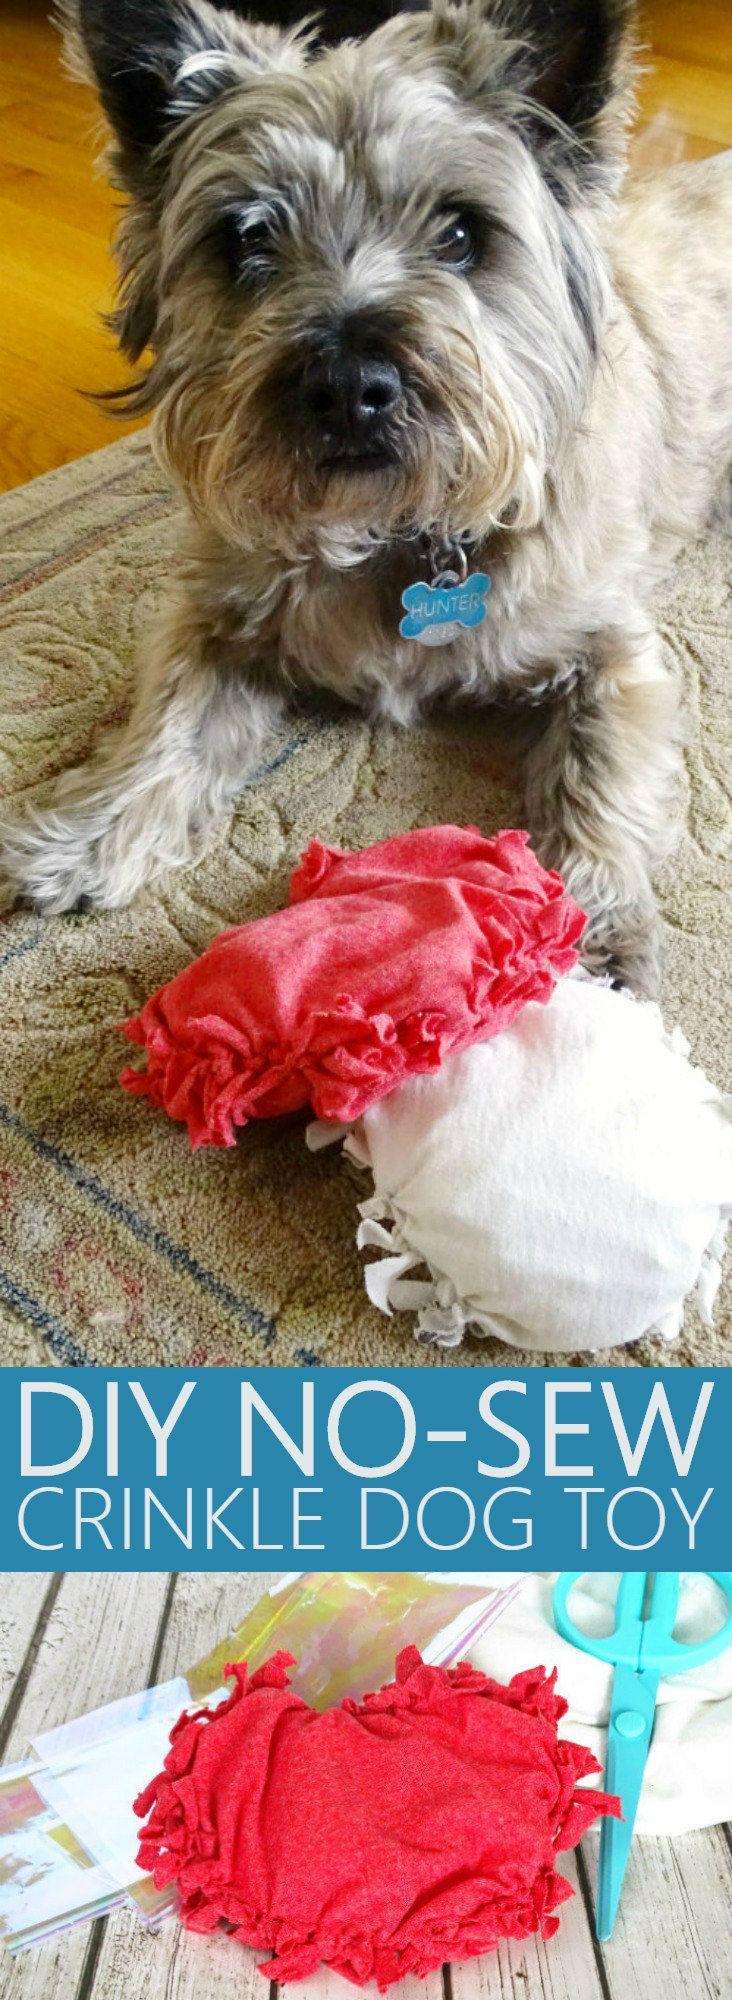 Diy No Sew Crinkle Dog Toy My So Called Chaos Living La Vida